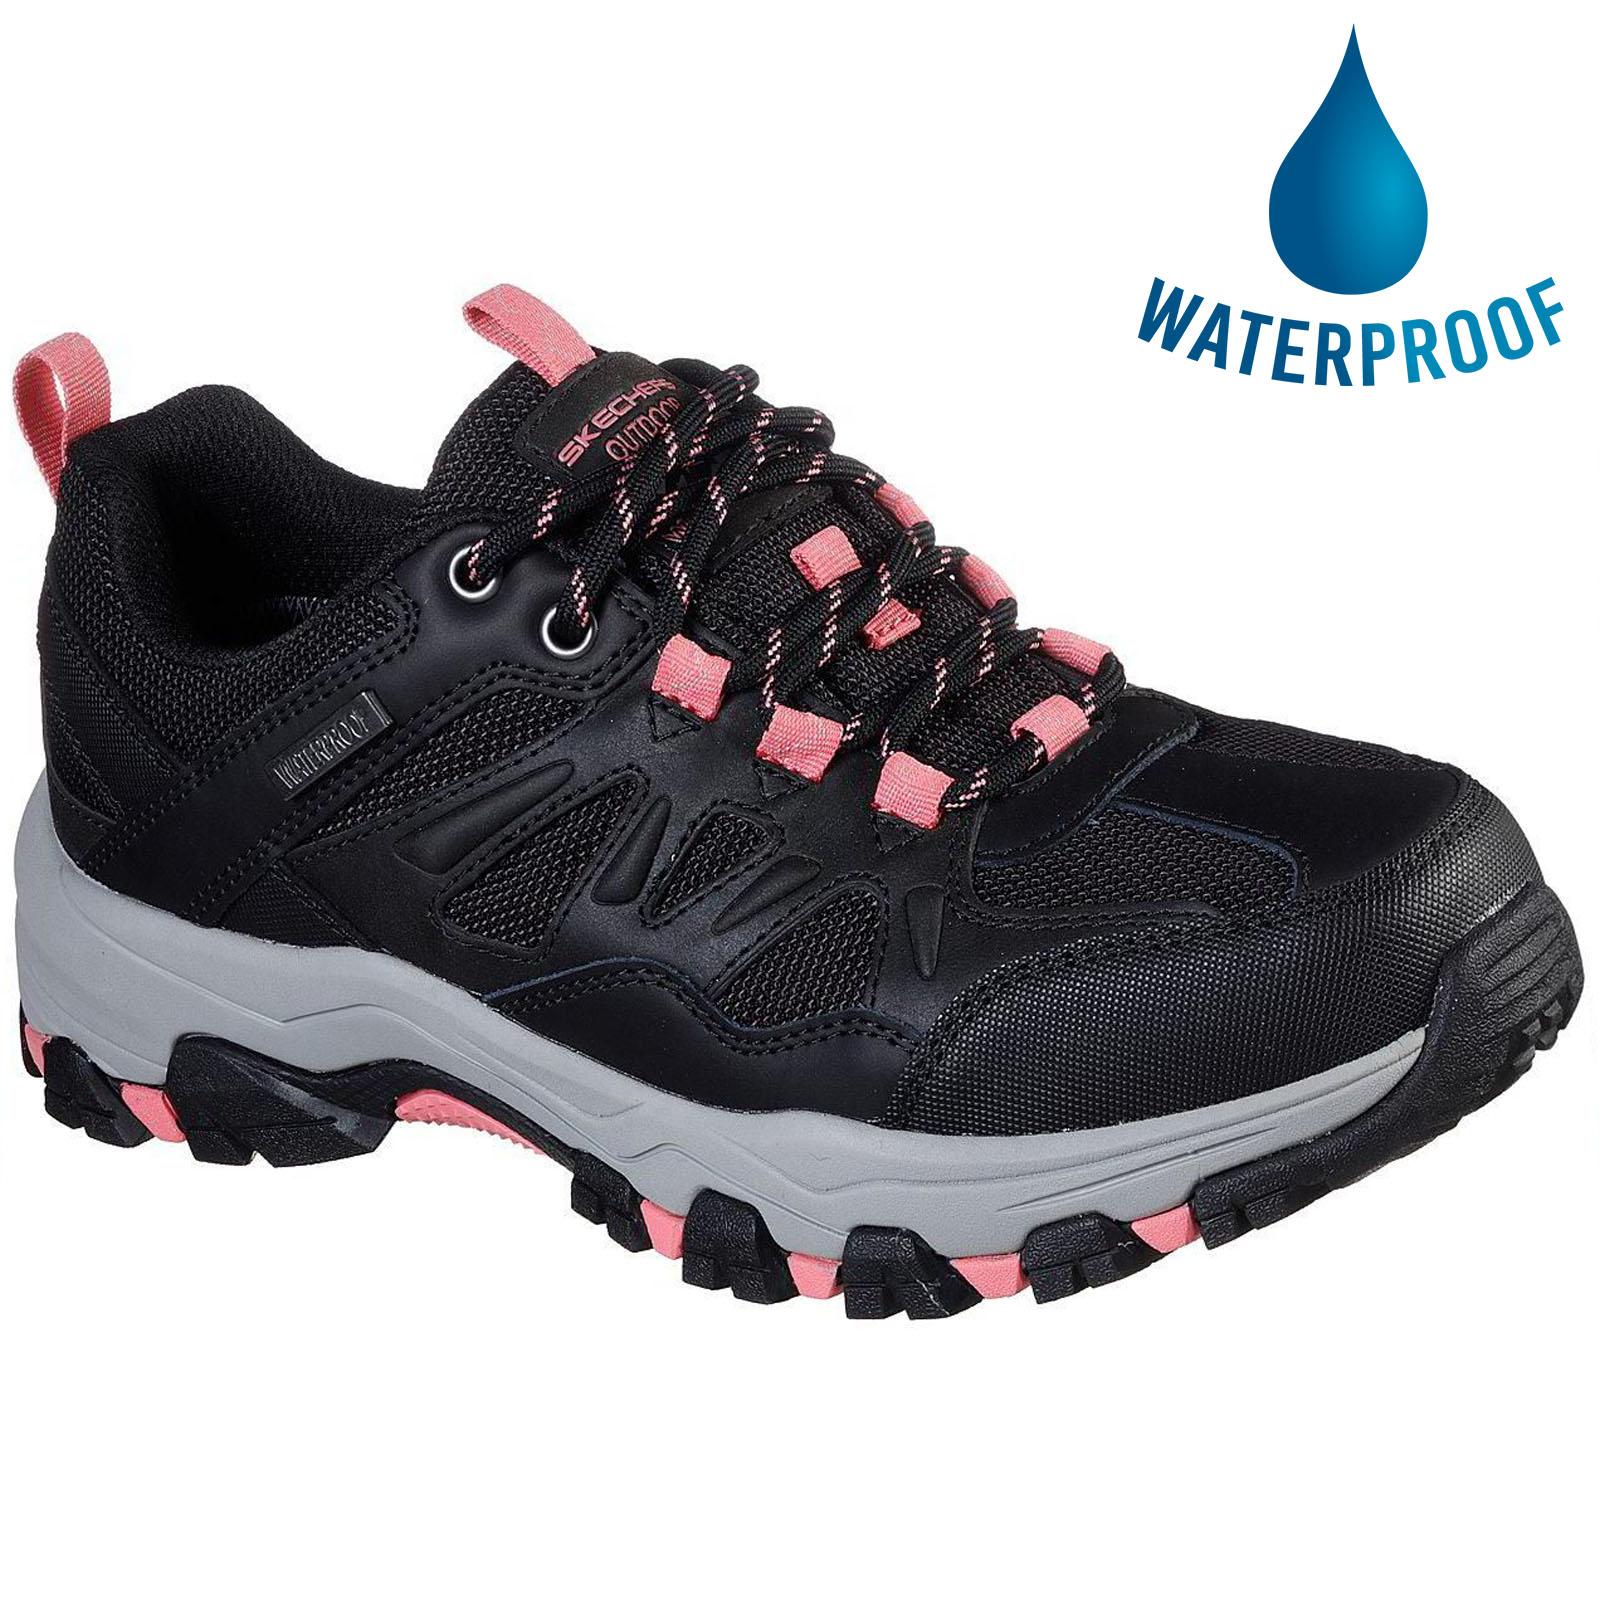 Skechers Womens Selmen West Highland Waterproof Trainer - Black Charcoal